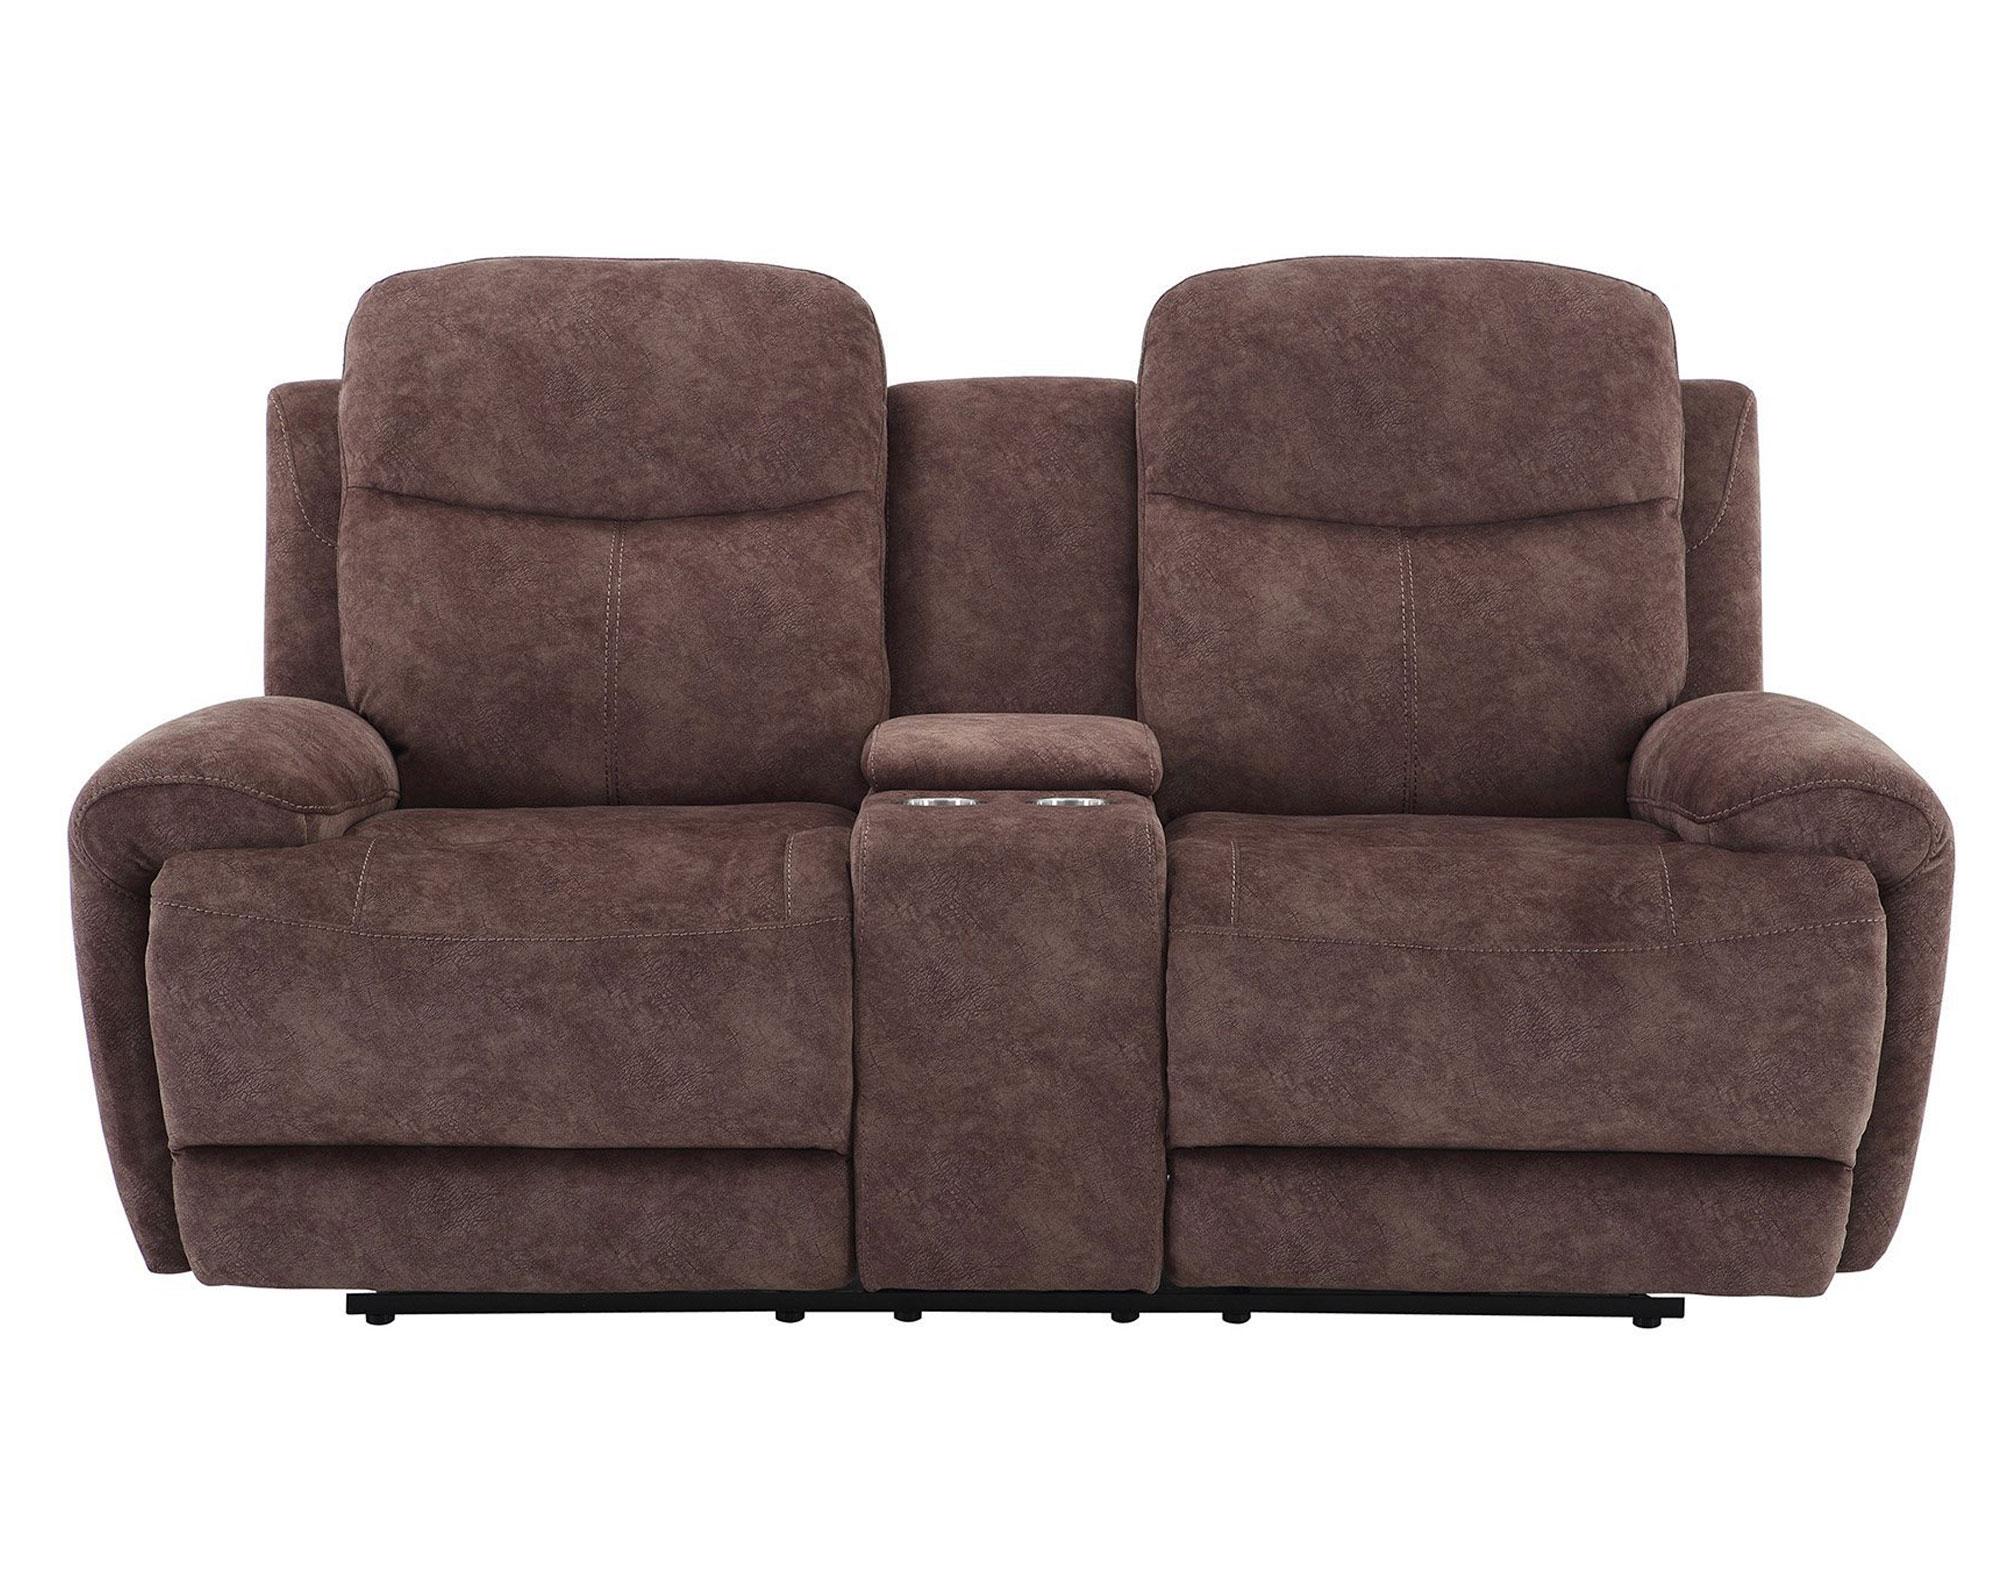 Fantastic Bowie Range Power Reclining Sofa With Power Sofas And Creativecarmelina Interior Chair Design Creativecarmelinacom